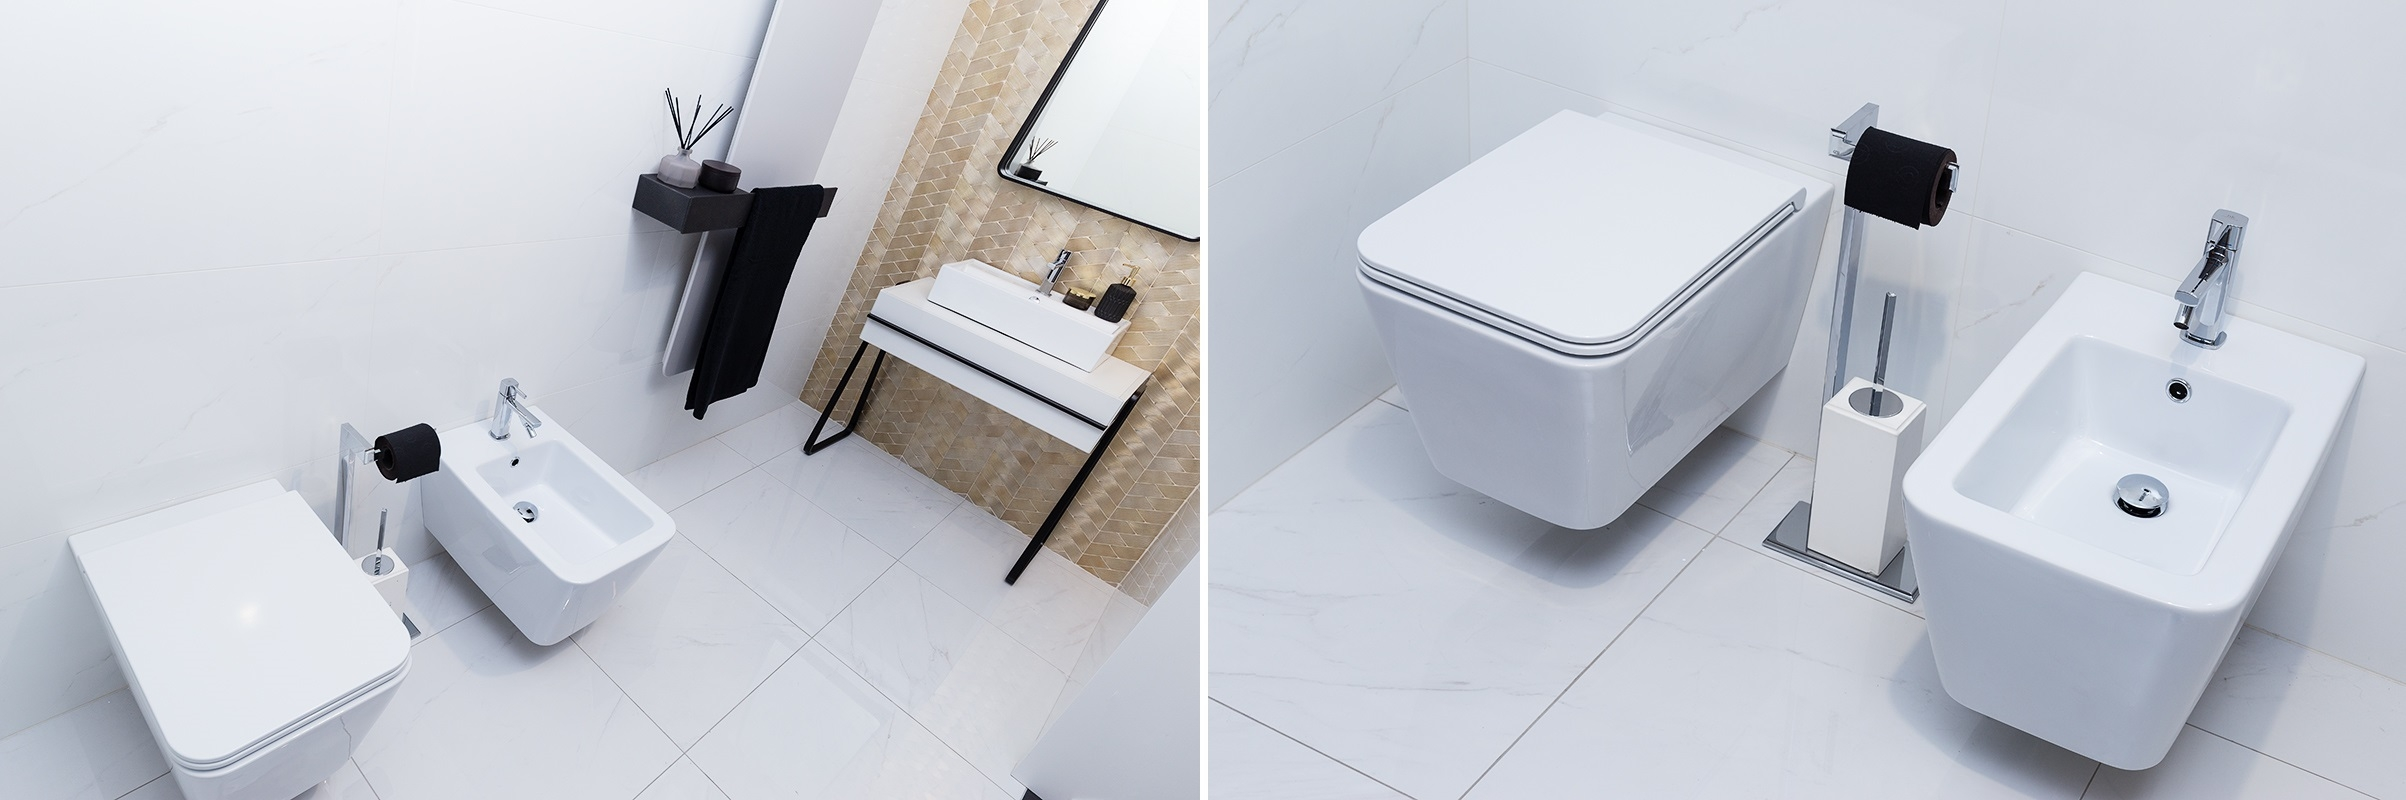 Bidet i miska WC Hushlab